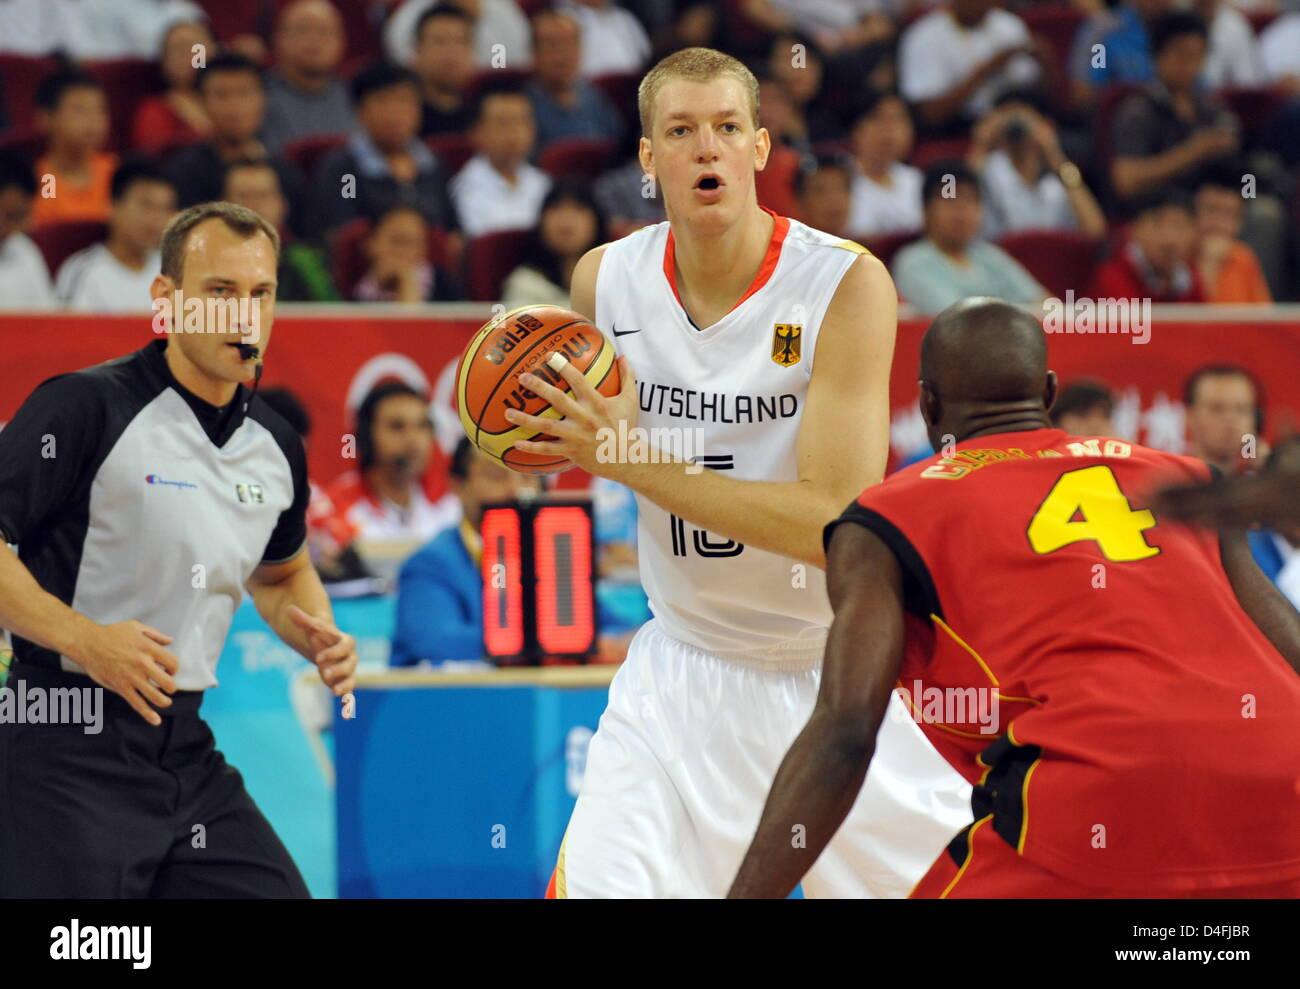 the german basketball player jan hendrik jagla c vies with olimpio